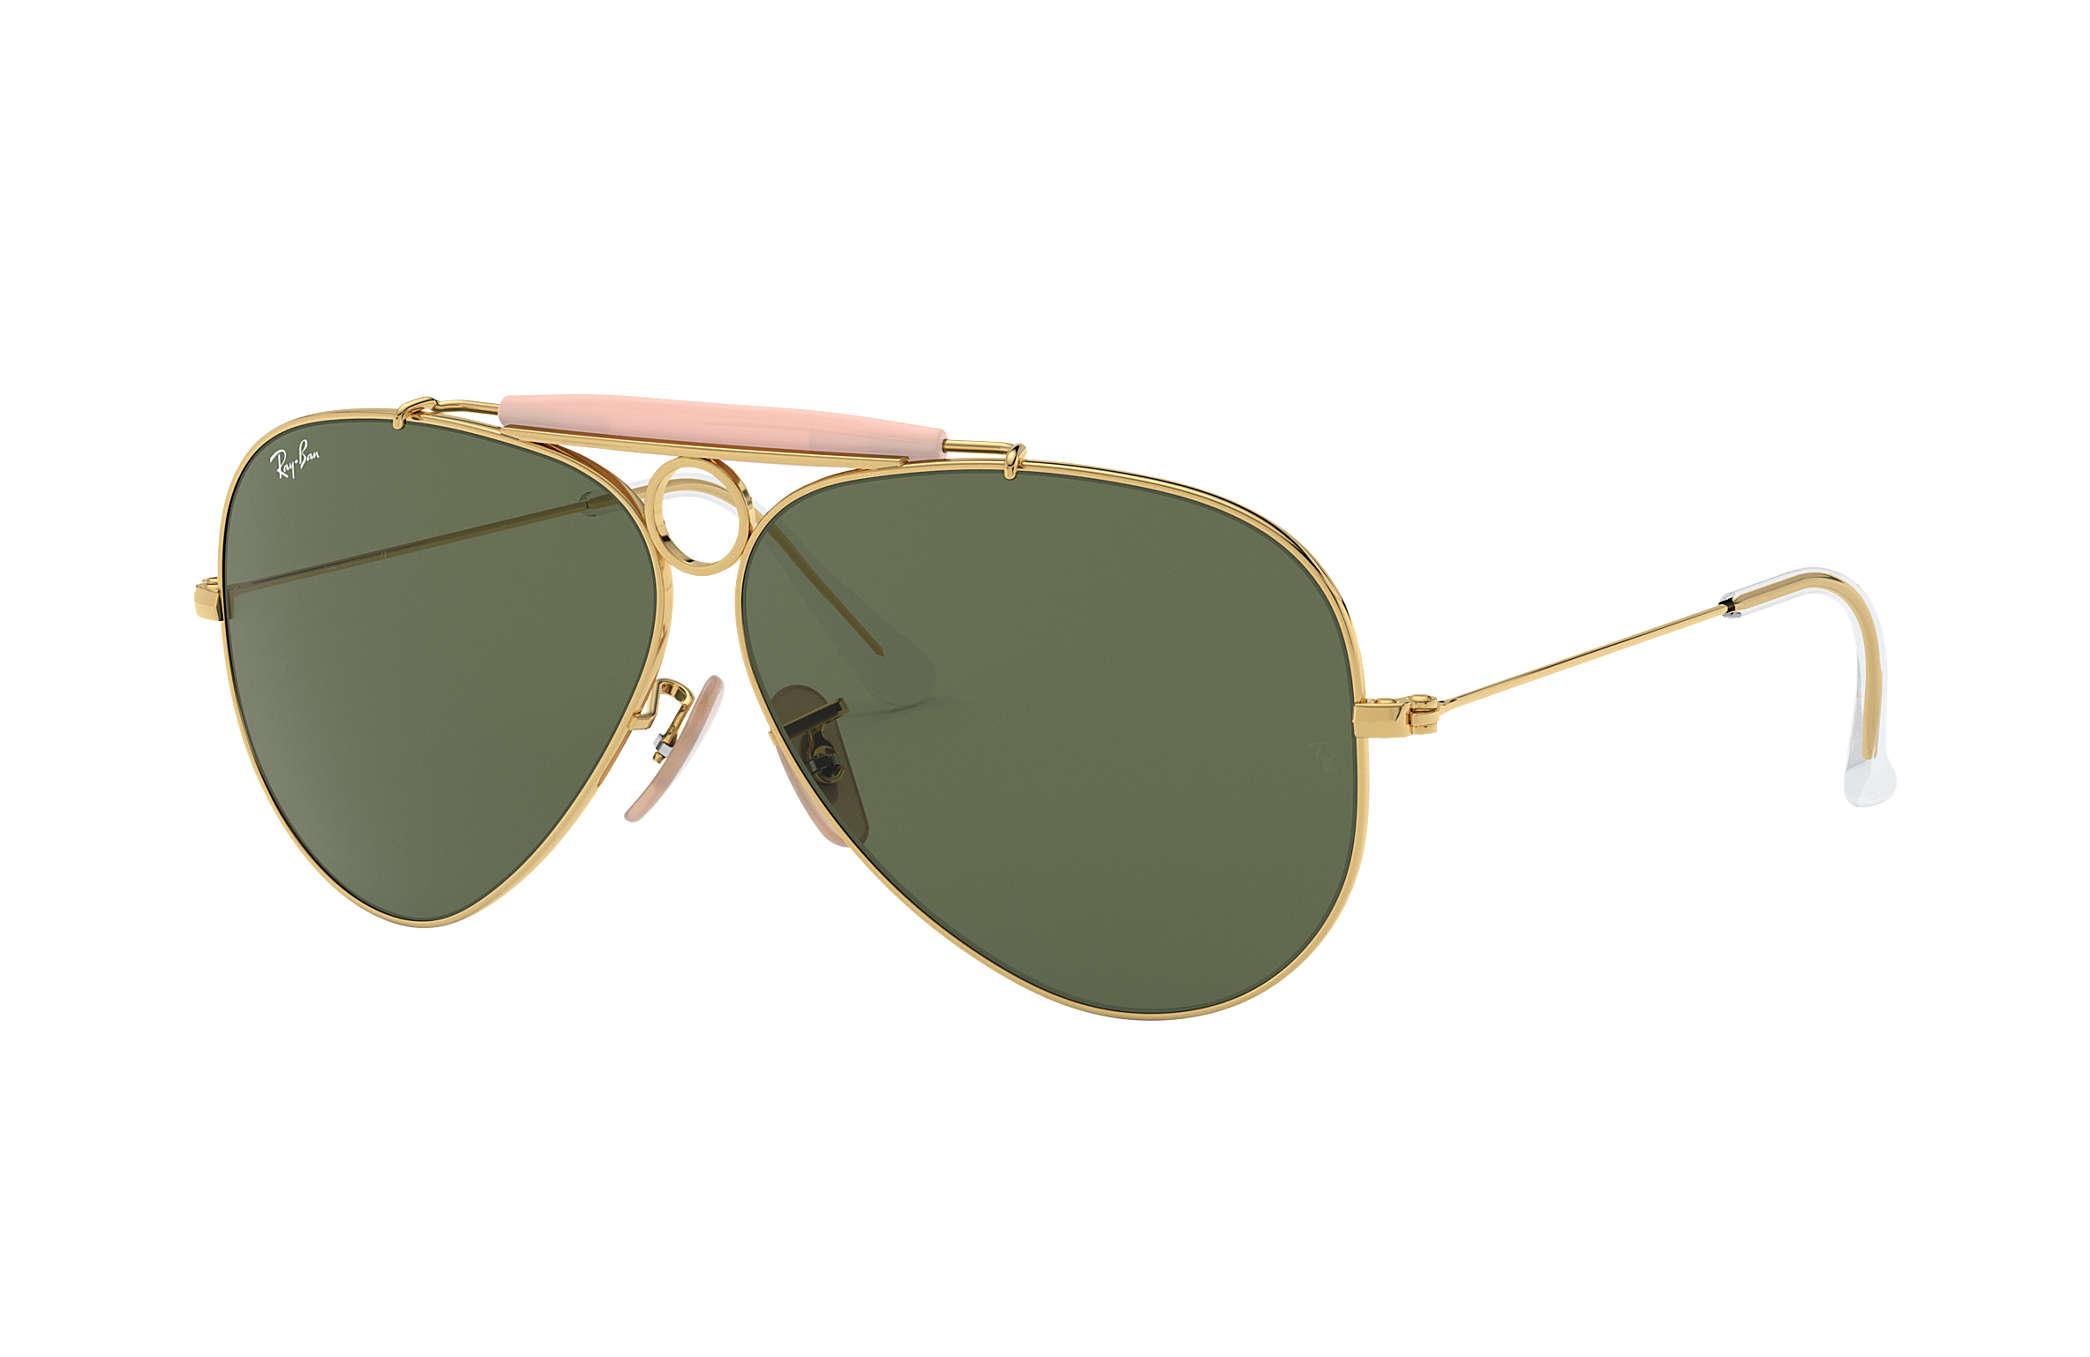 ray ban glasses frames target  805289003694_shad_qt?$zoom$